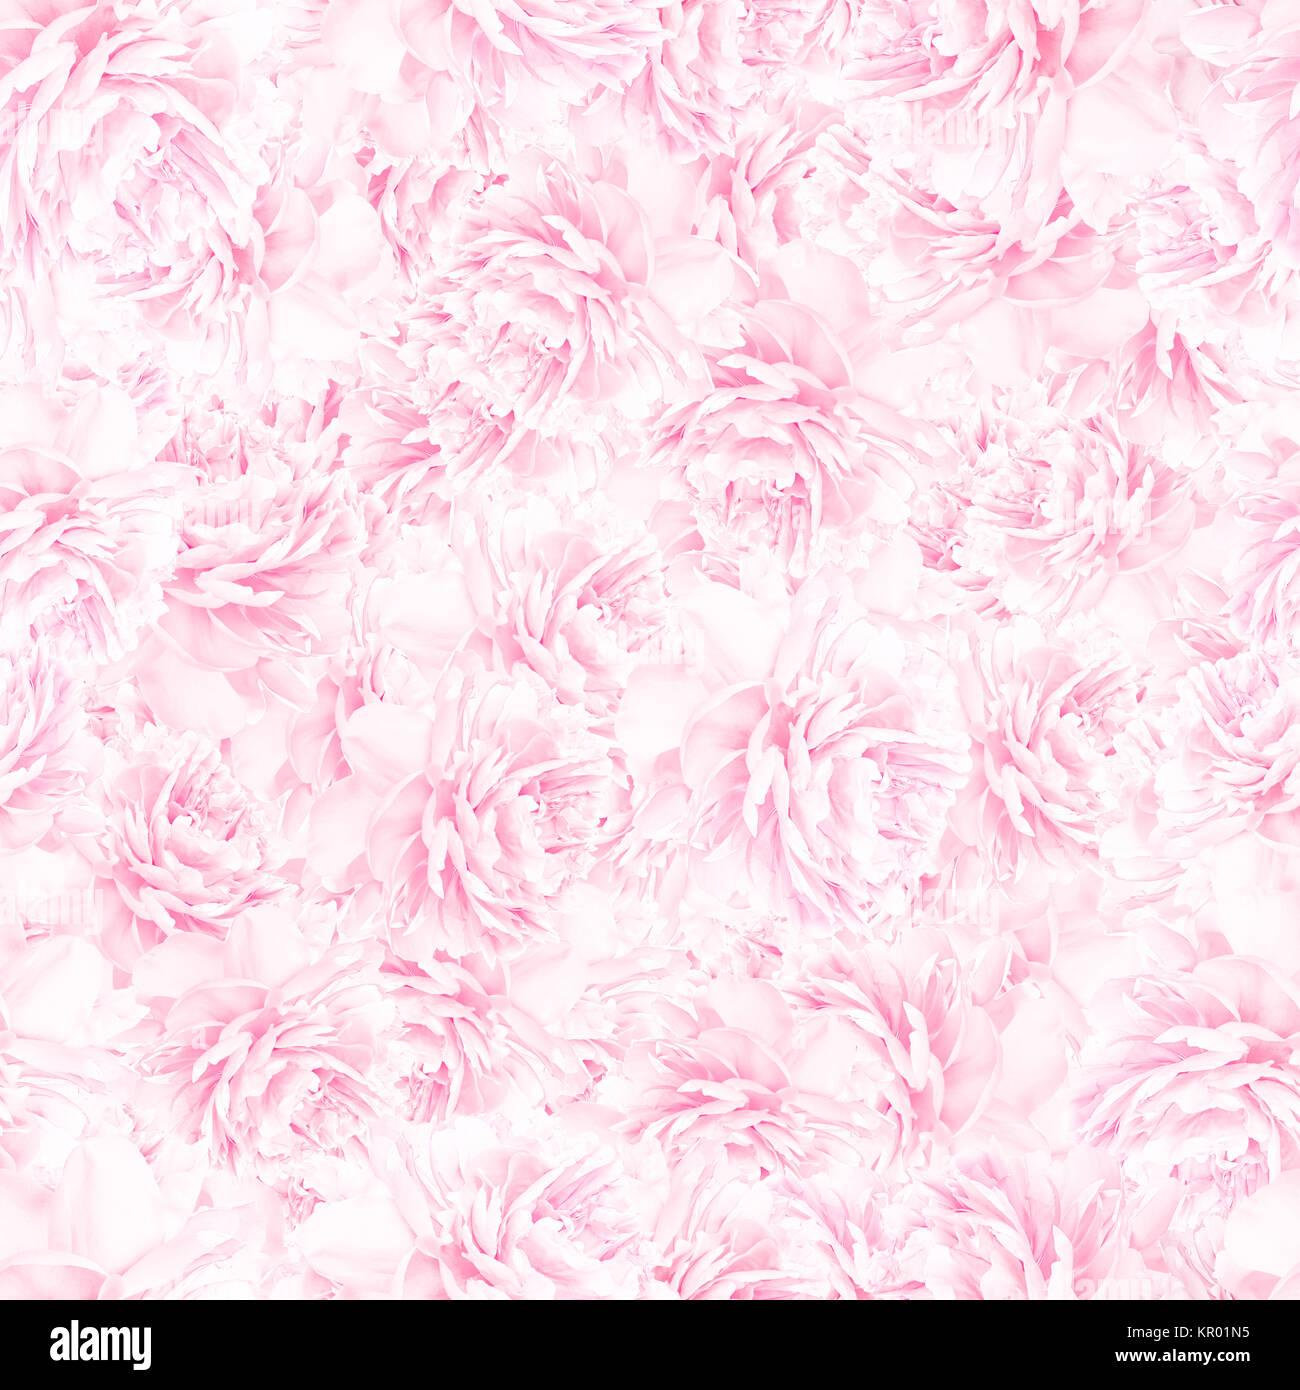 Light Pink Floral Pattern Ibhalo Parkersydnorhistoric Org